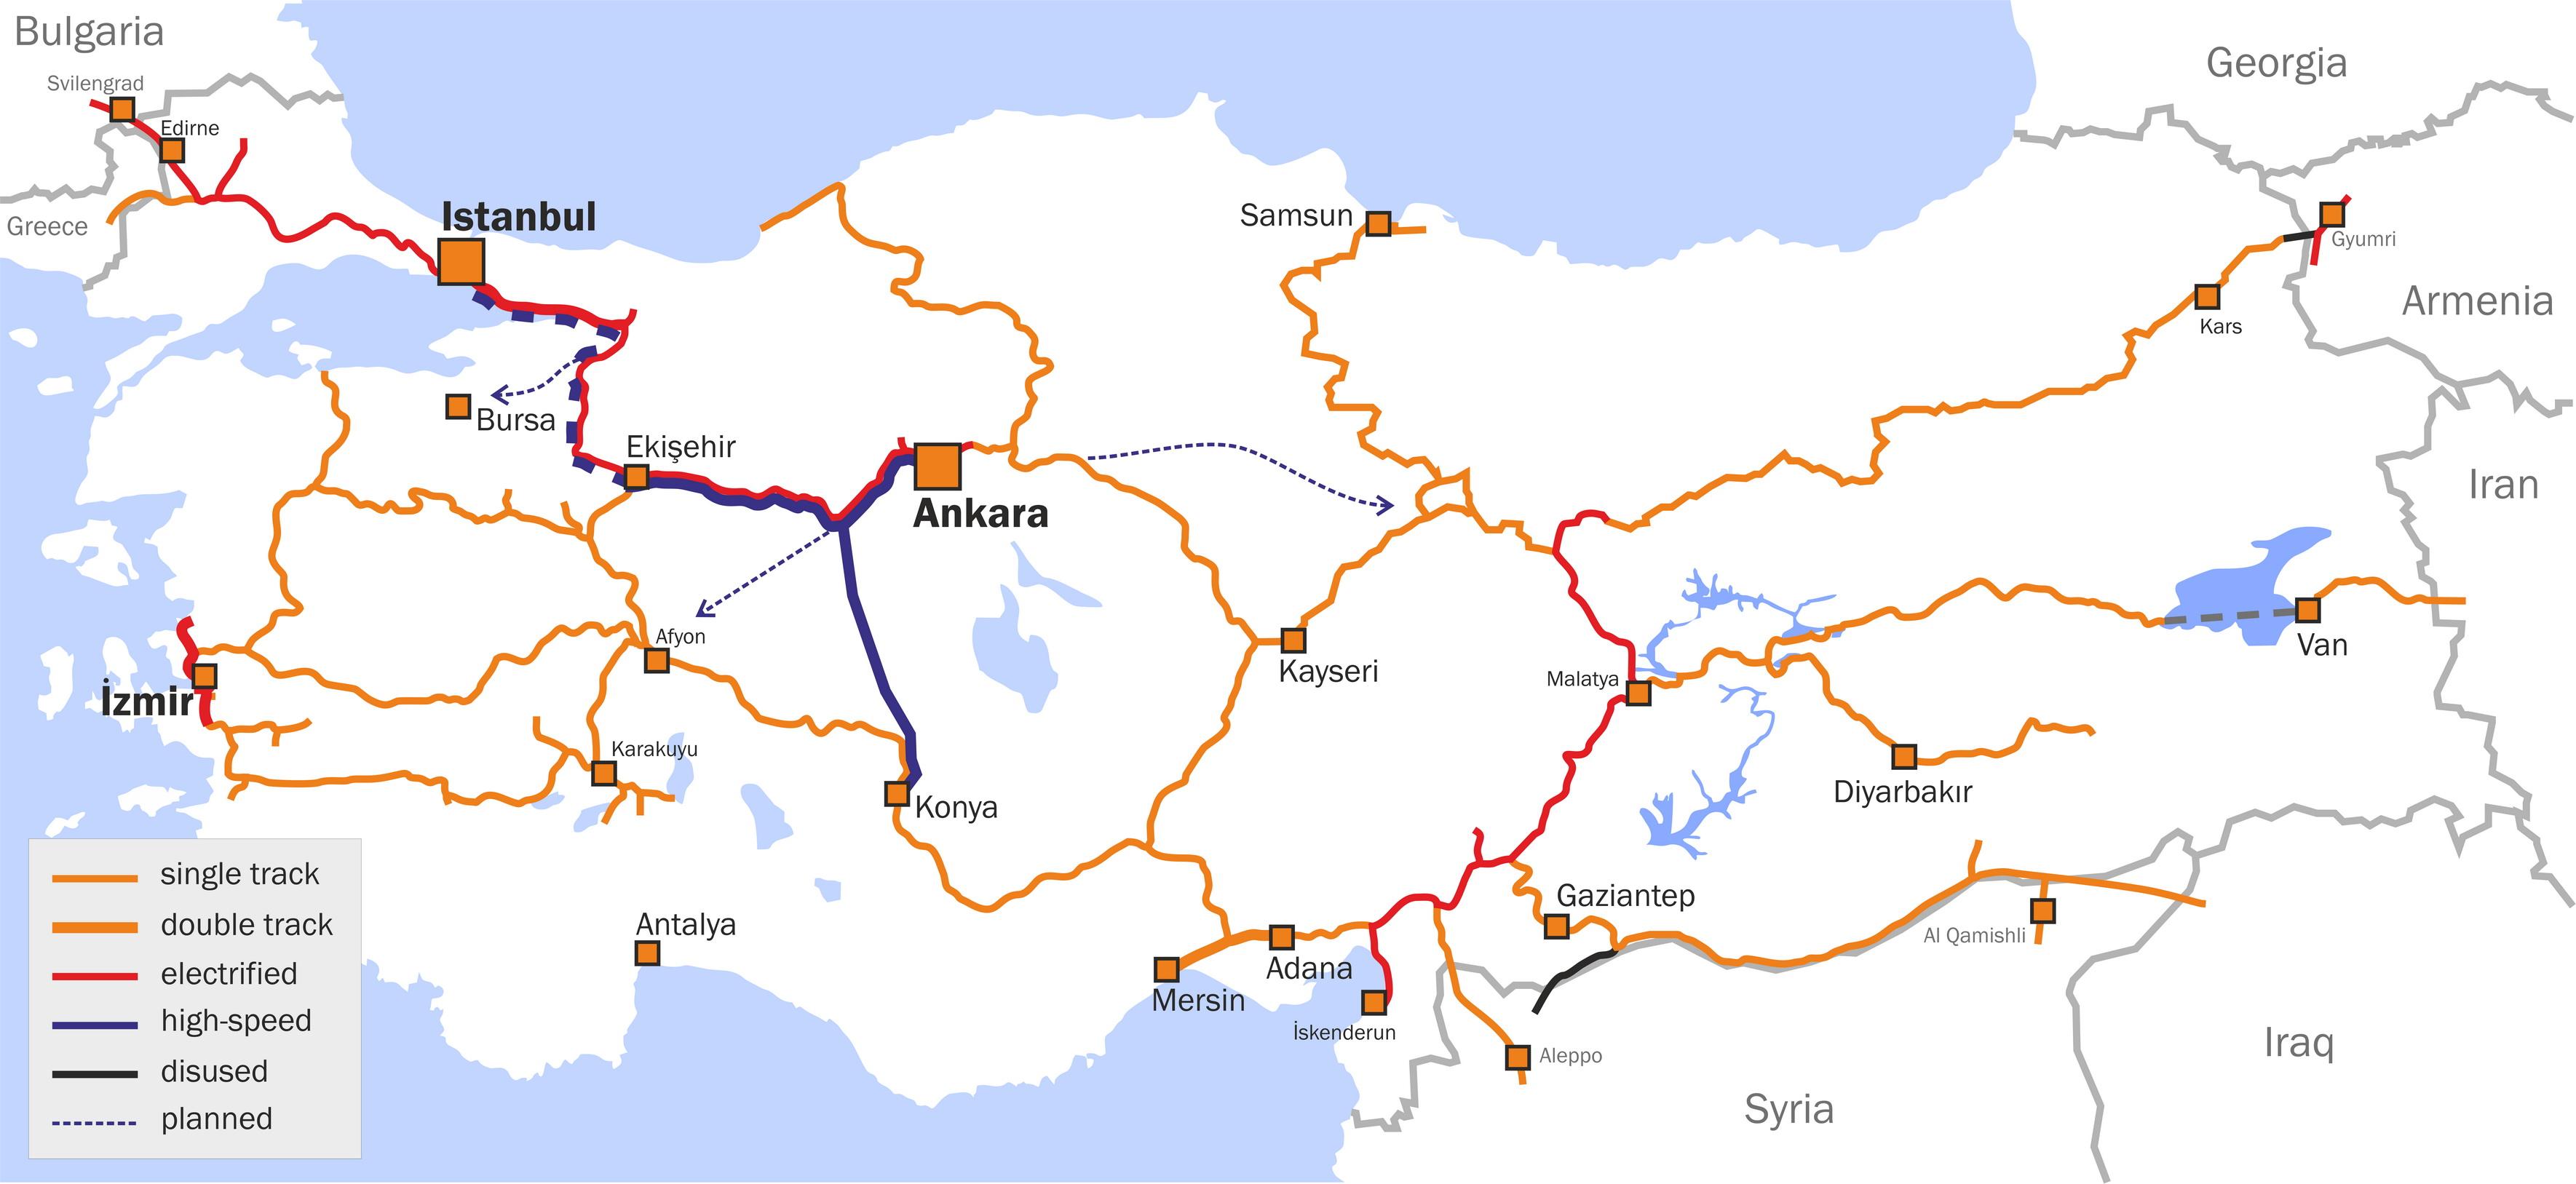 Jernbaner I Tyrkiet Kort Website Fotos